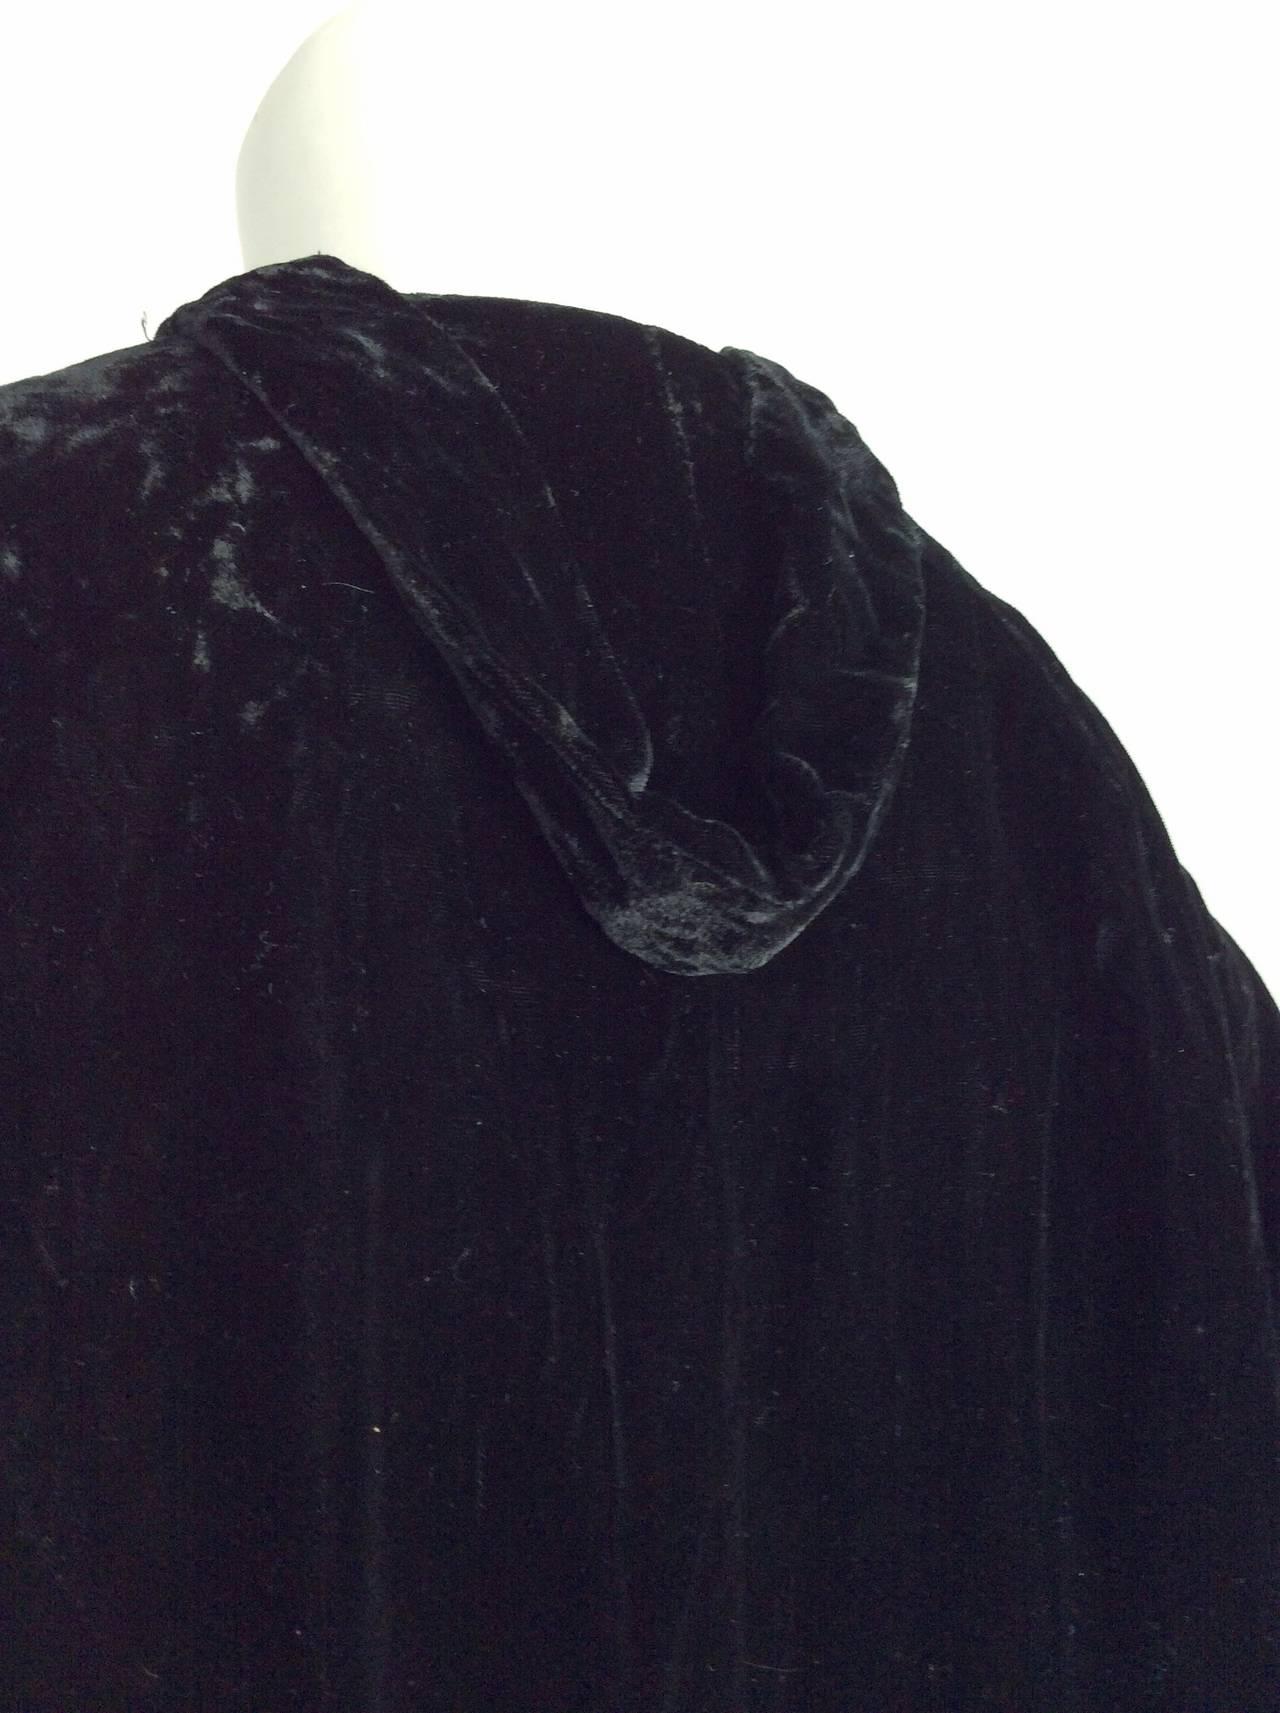 Extremely Rare 1950s Ceil Chapman Black Velvet Milium Cloak Jacket 6